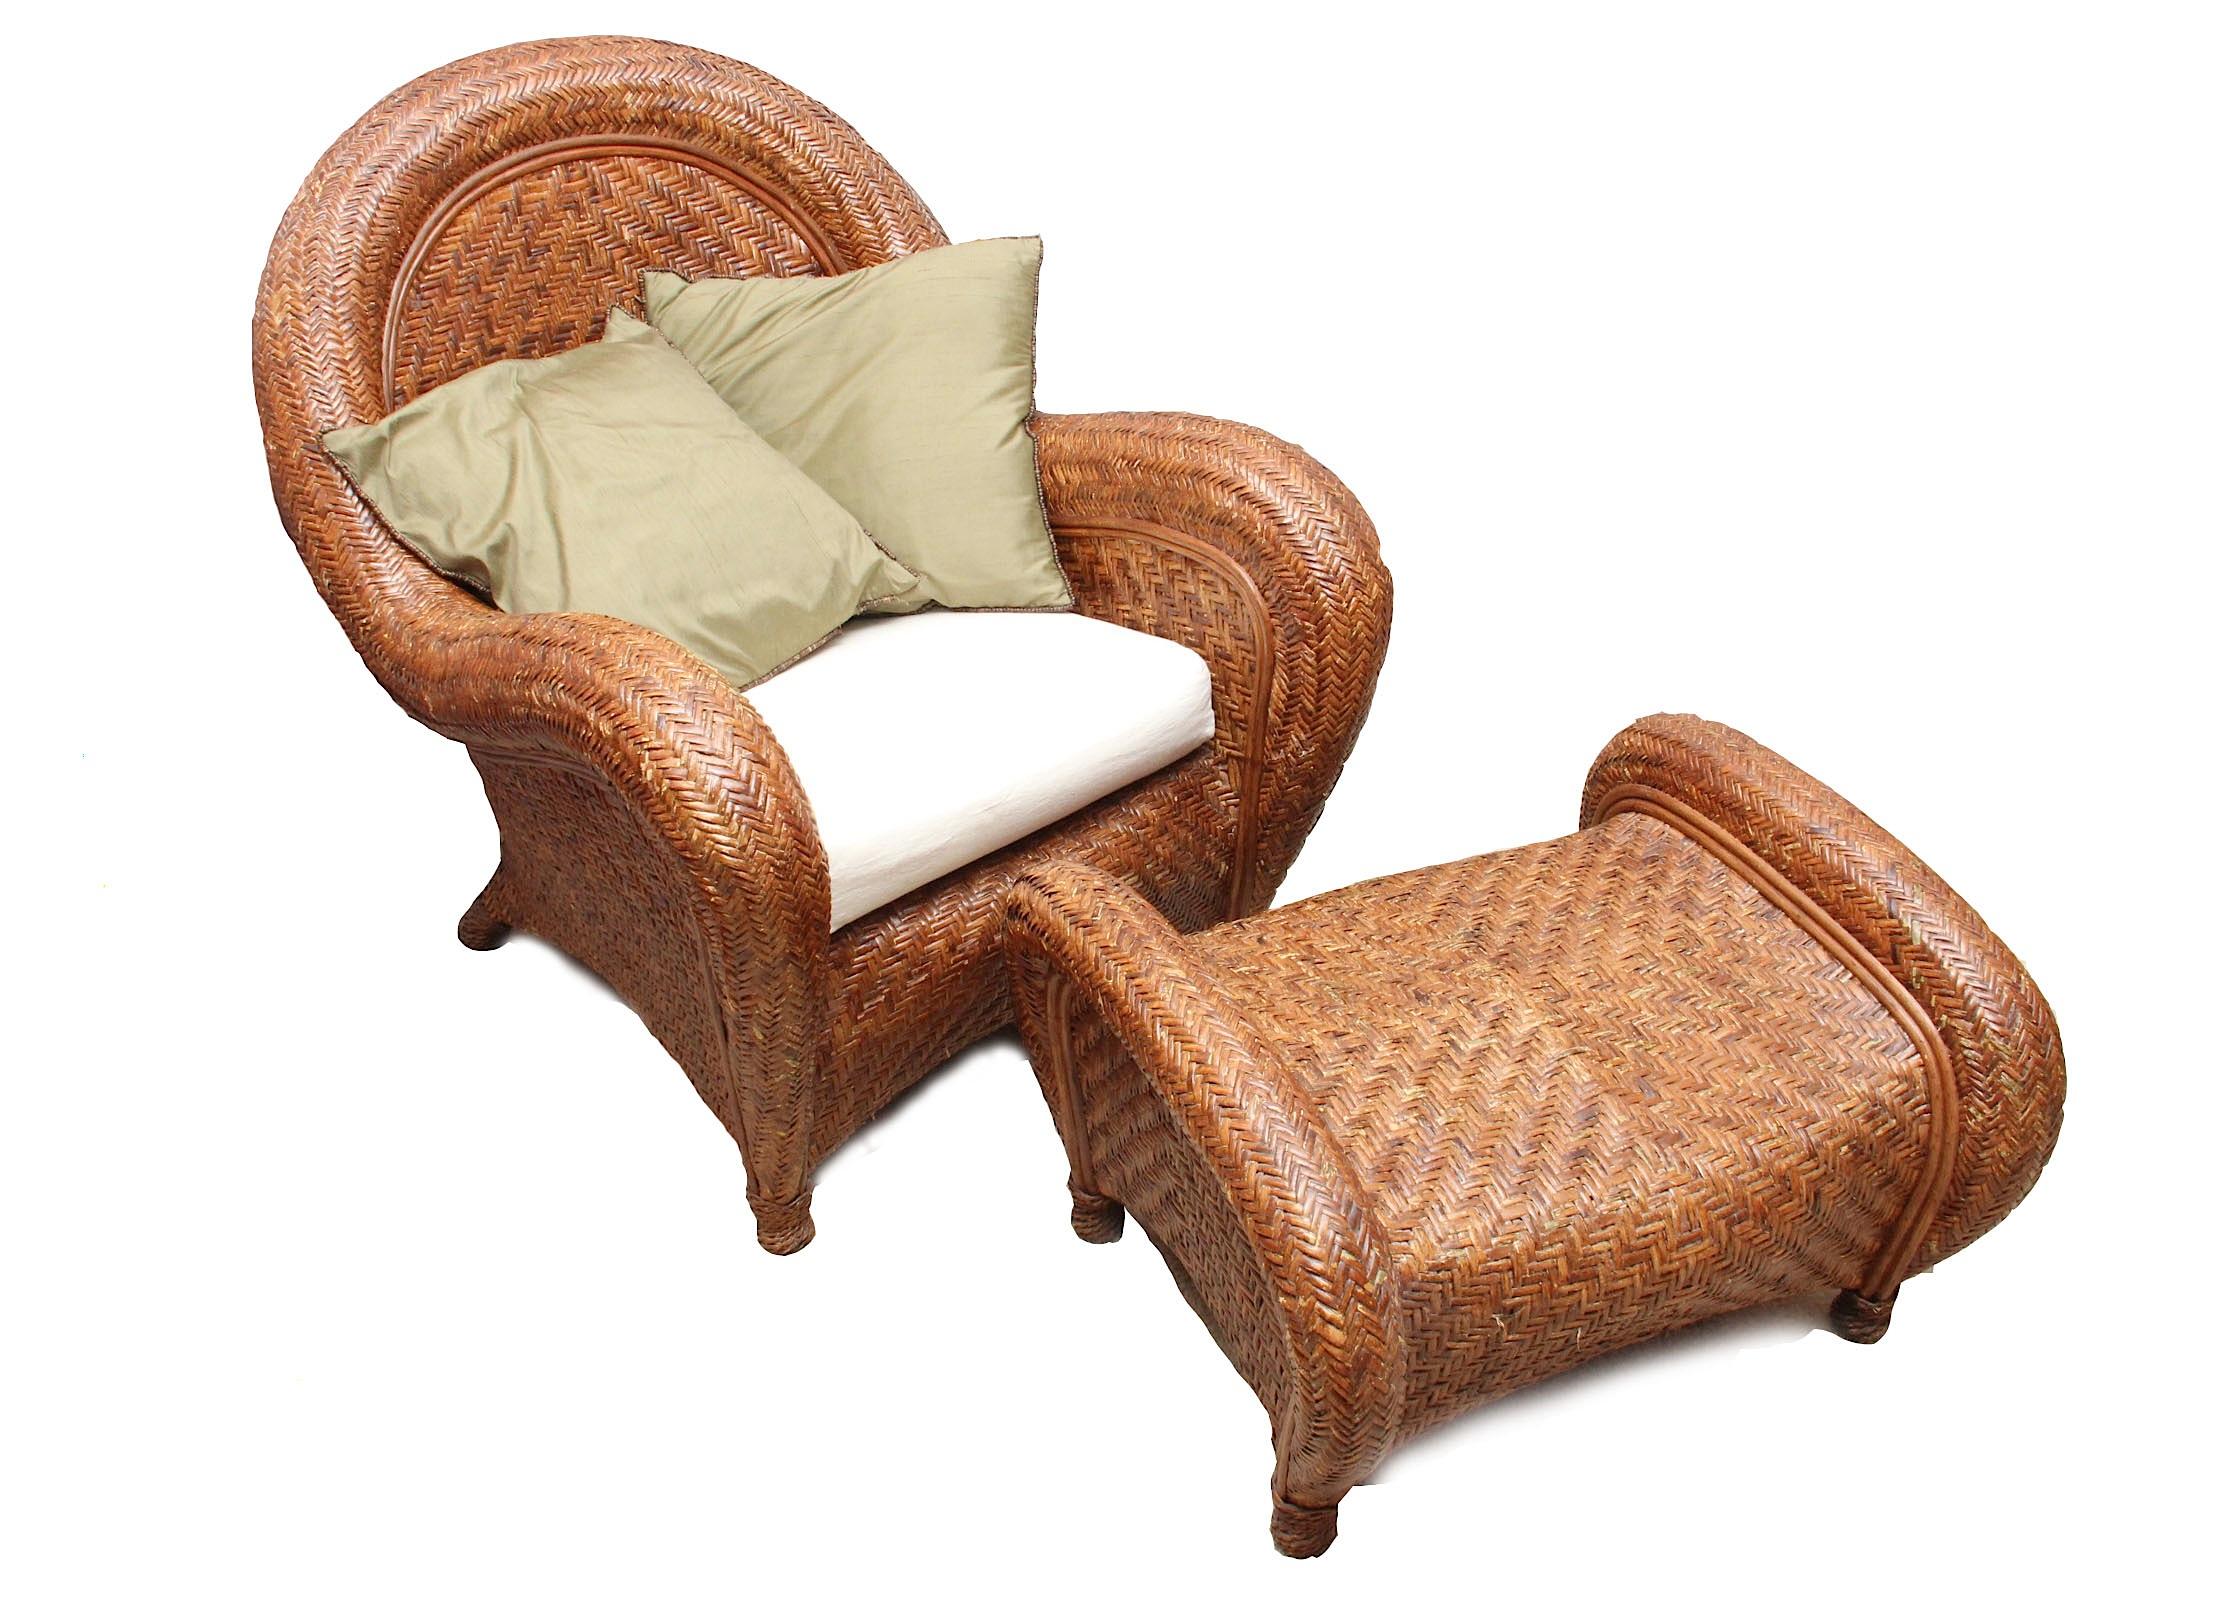 Pottery Barn Rattan  Pottery Barn Rattan Chair L45